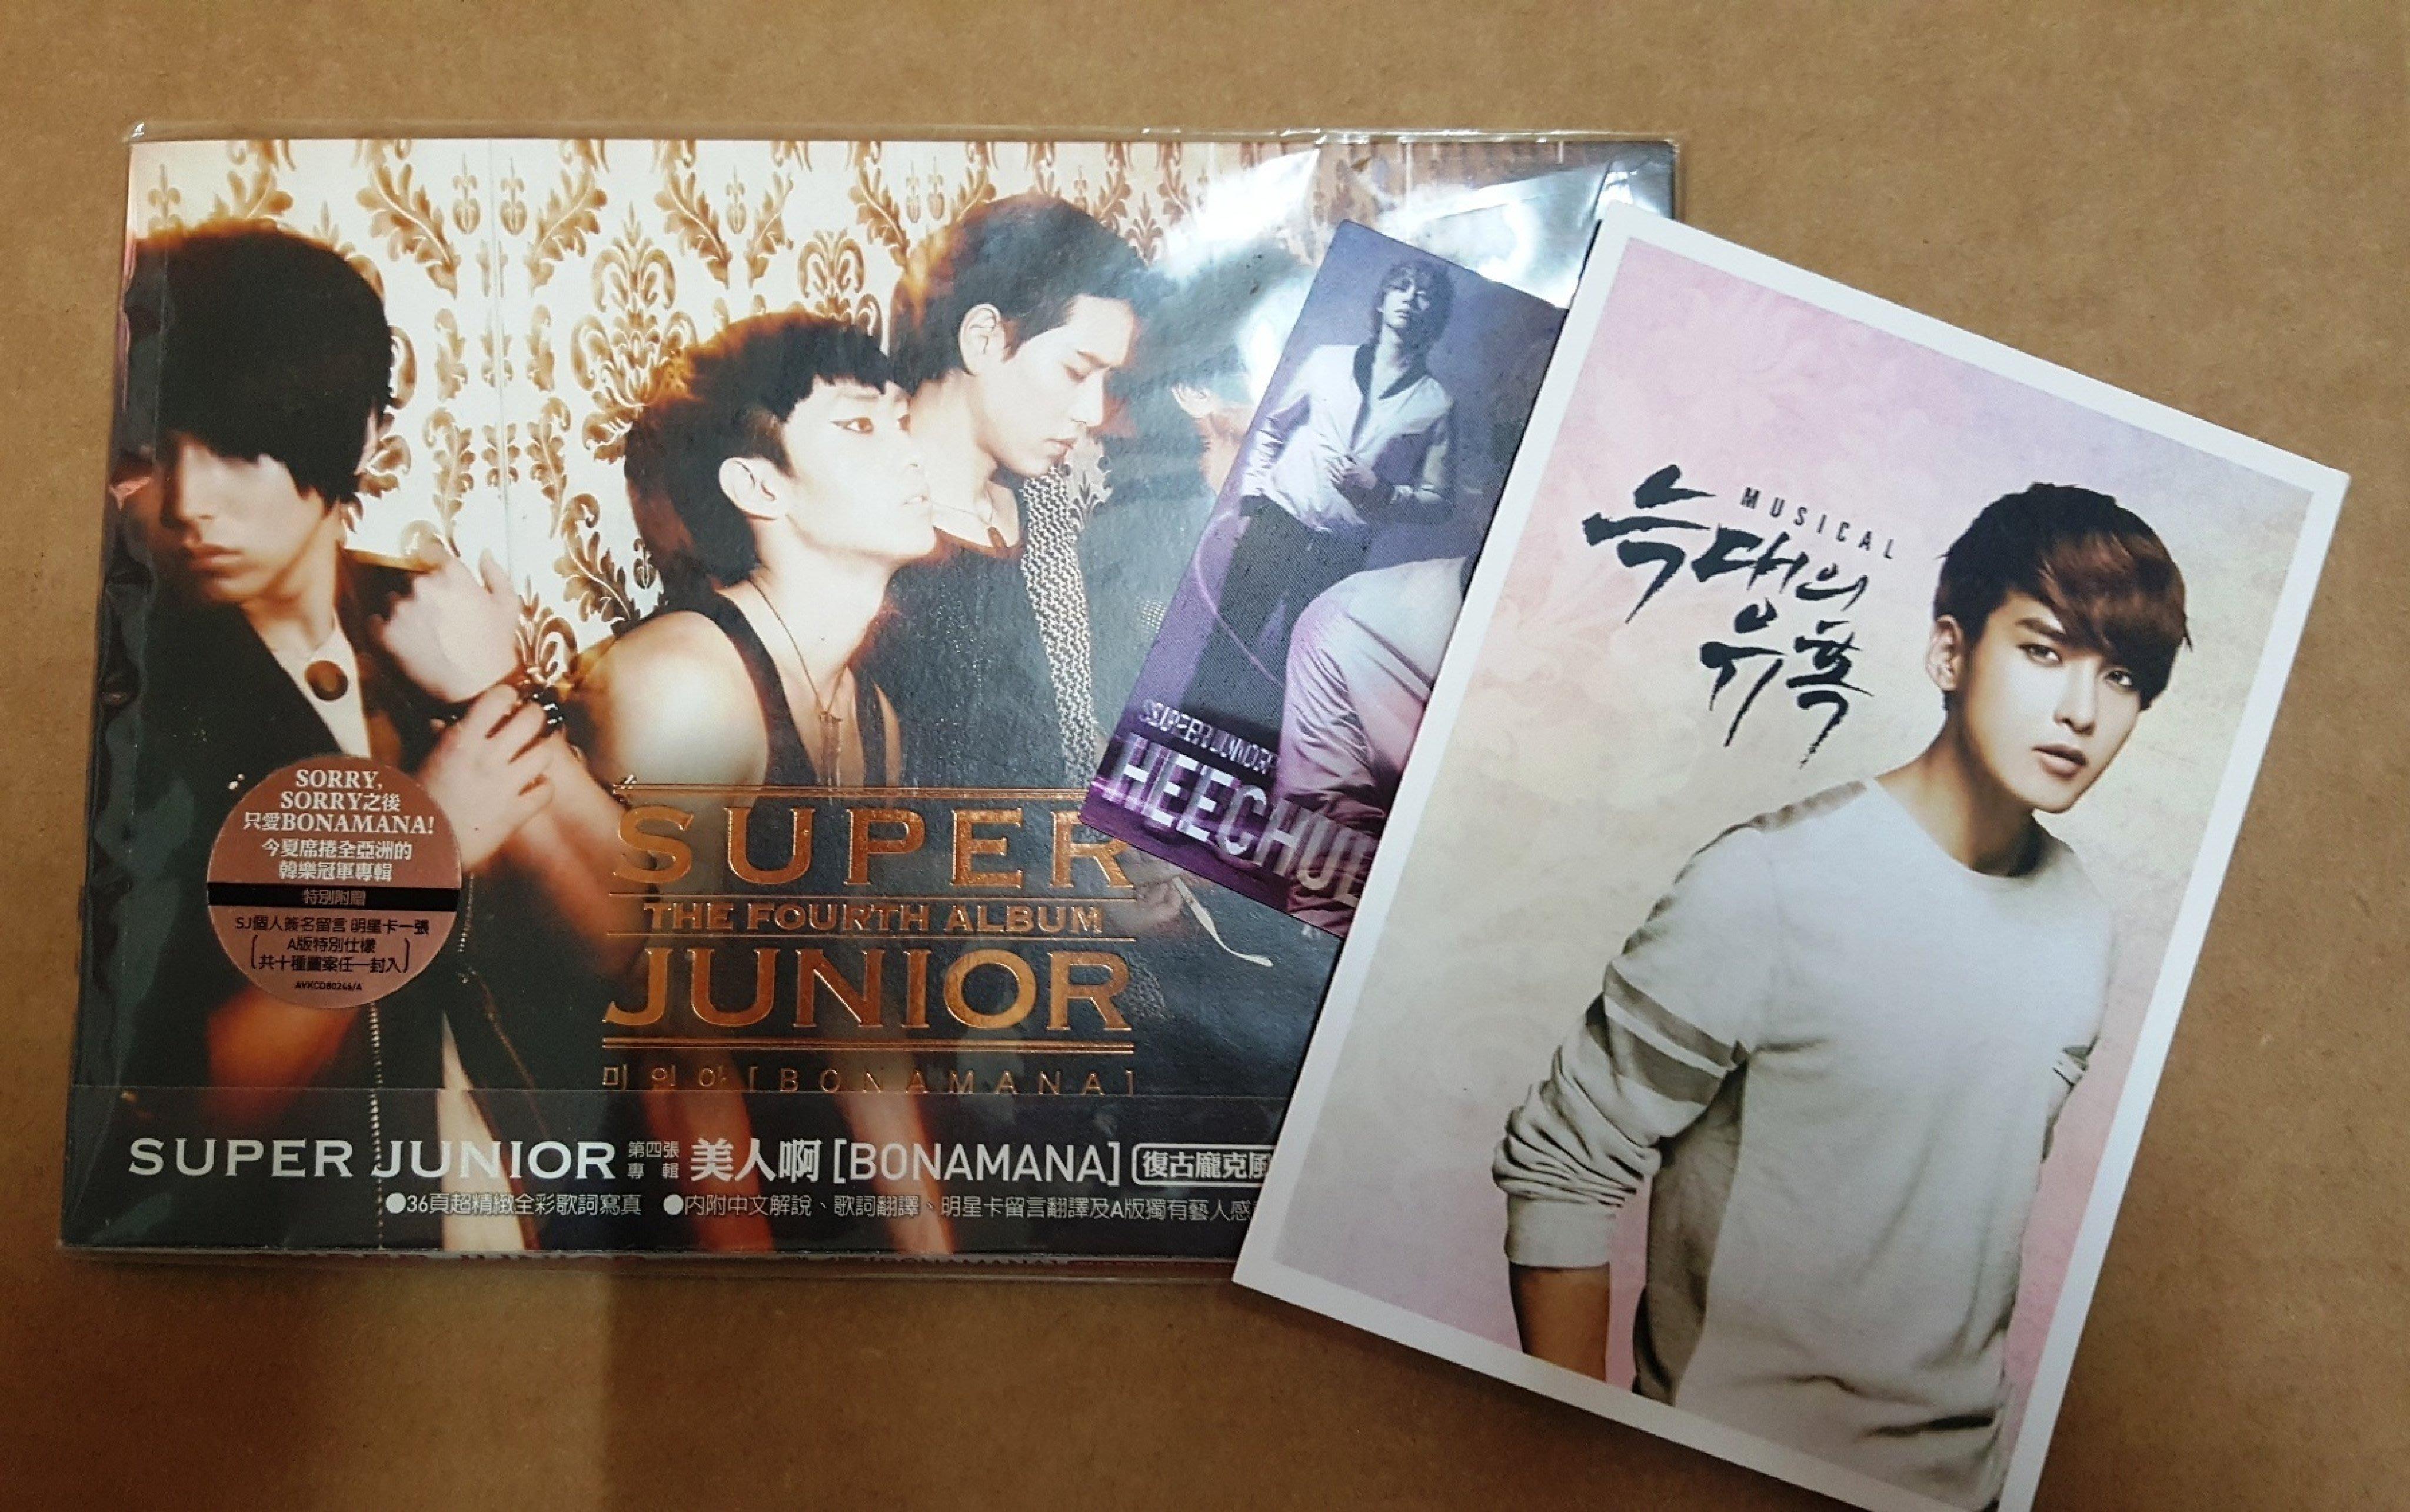 Super Junior 美人啊 Bonamana A版 專輯 銀赫 東海 始源 圭賢 厲旭 利特 藝聲 晟敏 希澈